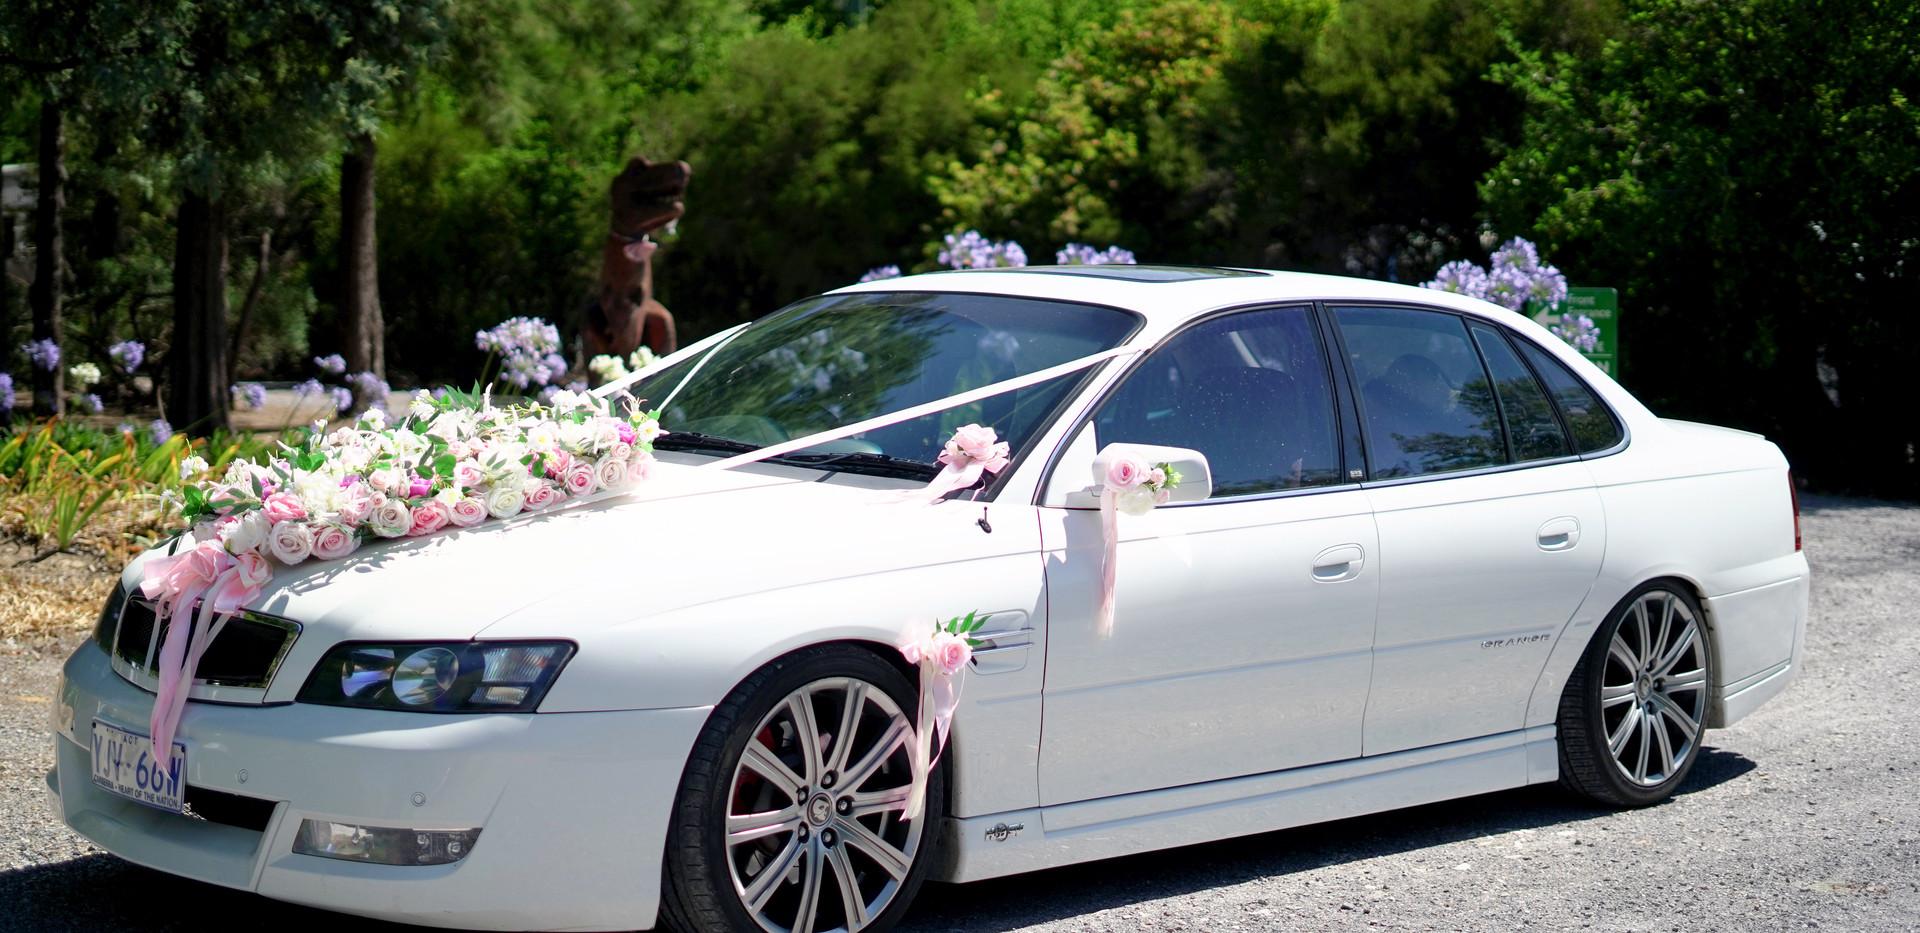 rebrowgarden_weddingcar.JPG